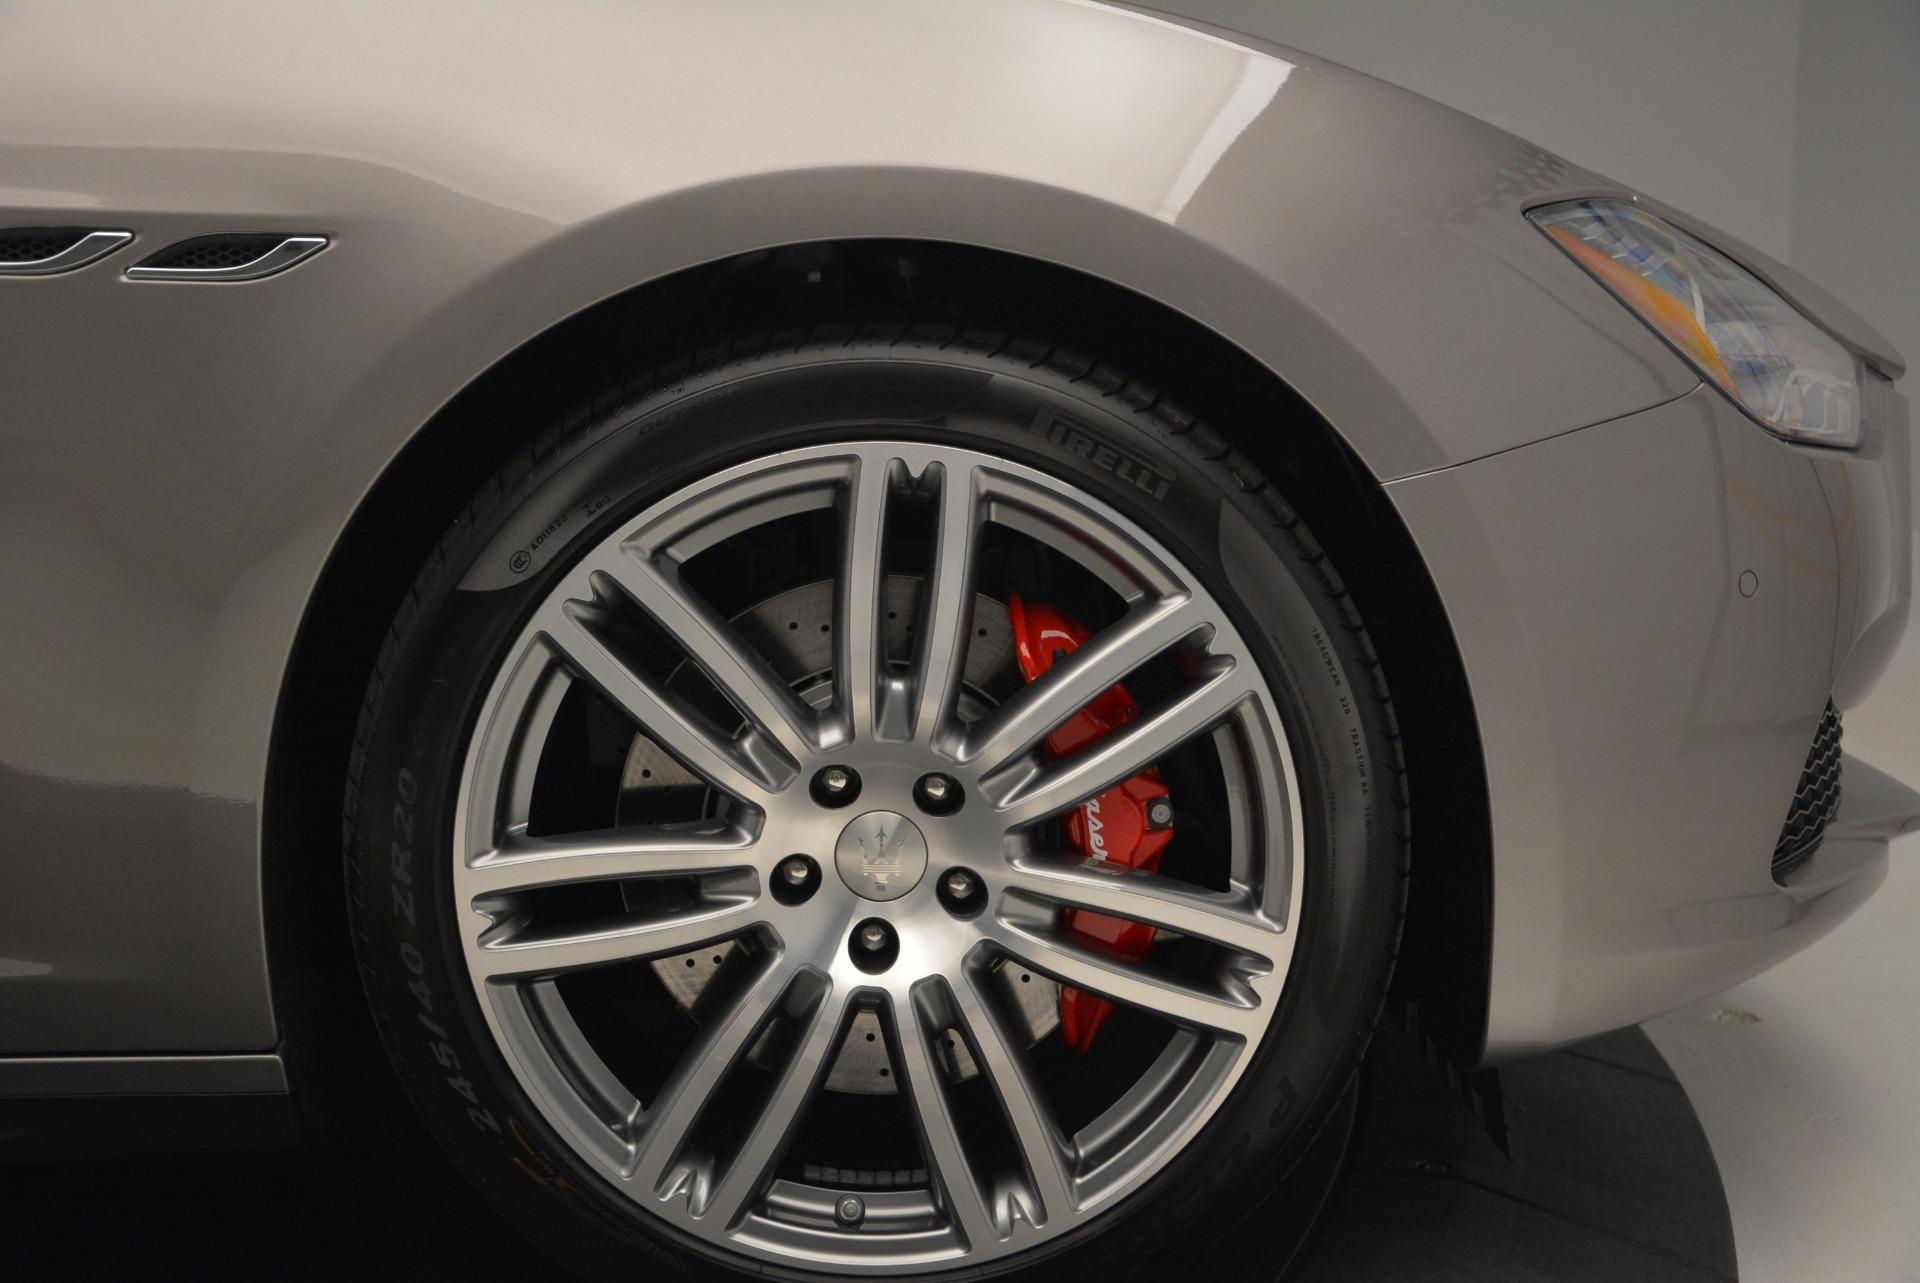 Used 2014 Maserati Ghibli S Q4 For Sale In Greenwich, CT 2562_p13